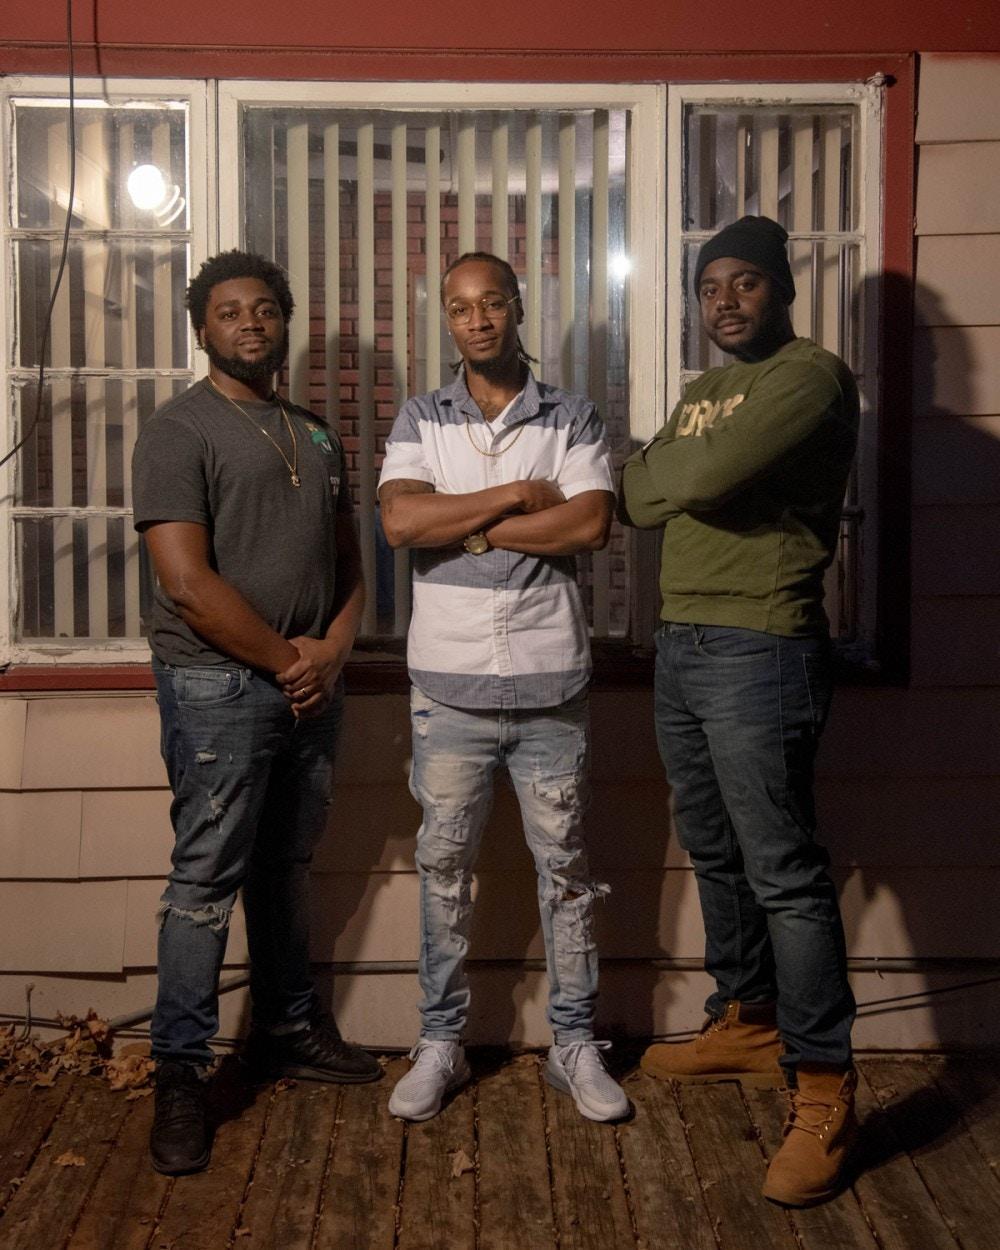 Siblings Brandon Mills, 21, Shemoi Edwards, 30, and Nickoy Edwards 27 in Flint, MI, Friday, Nov. 20, 2020. (Cydni Elledge for The Intercept)